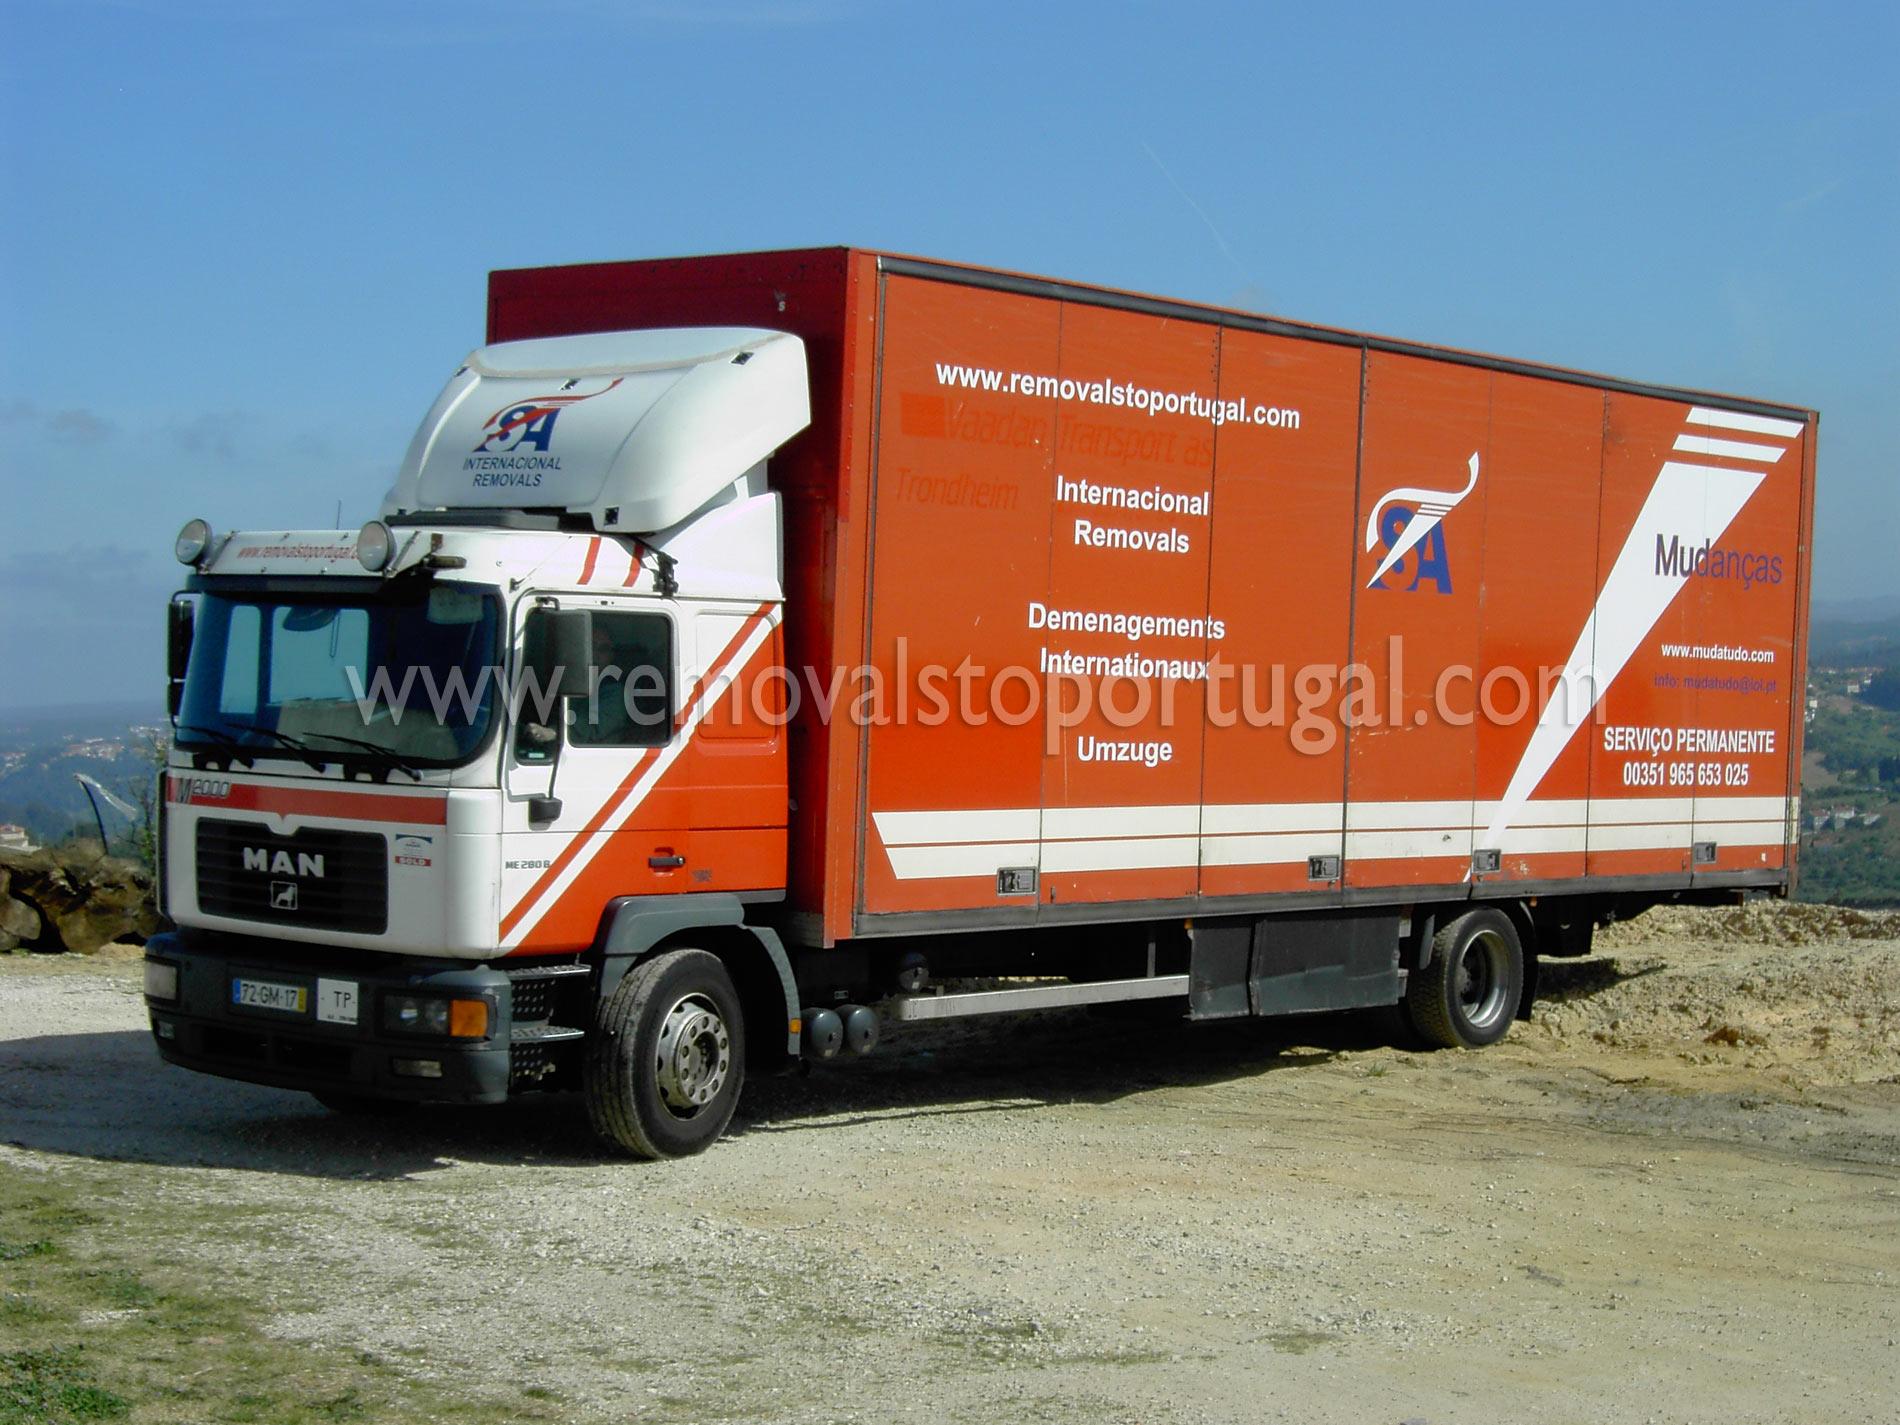 Removals to Portugal, Moving, Removals, Algarve, Oporto, Lisbon removals, Moving, Removals, International Removals, Déménagements/ Mudanzas/Umzuge, Verhuizers, Flyttning